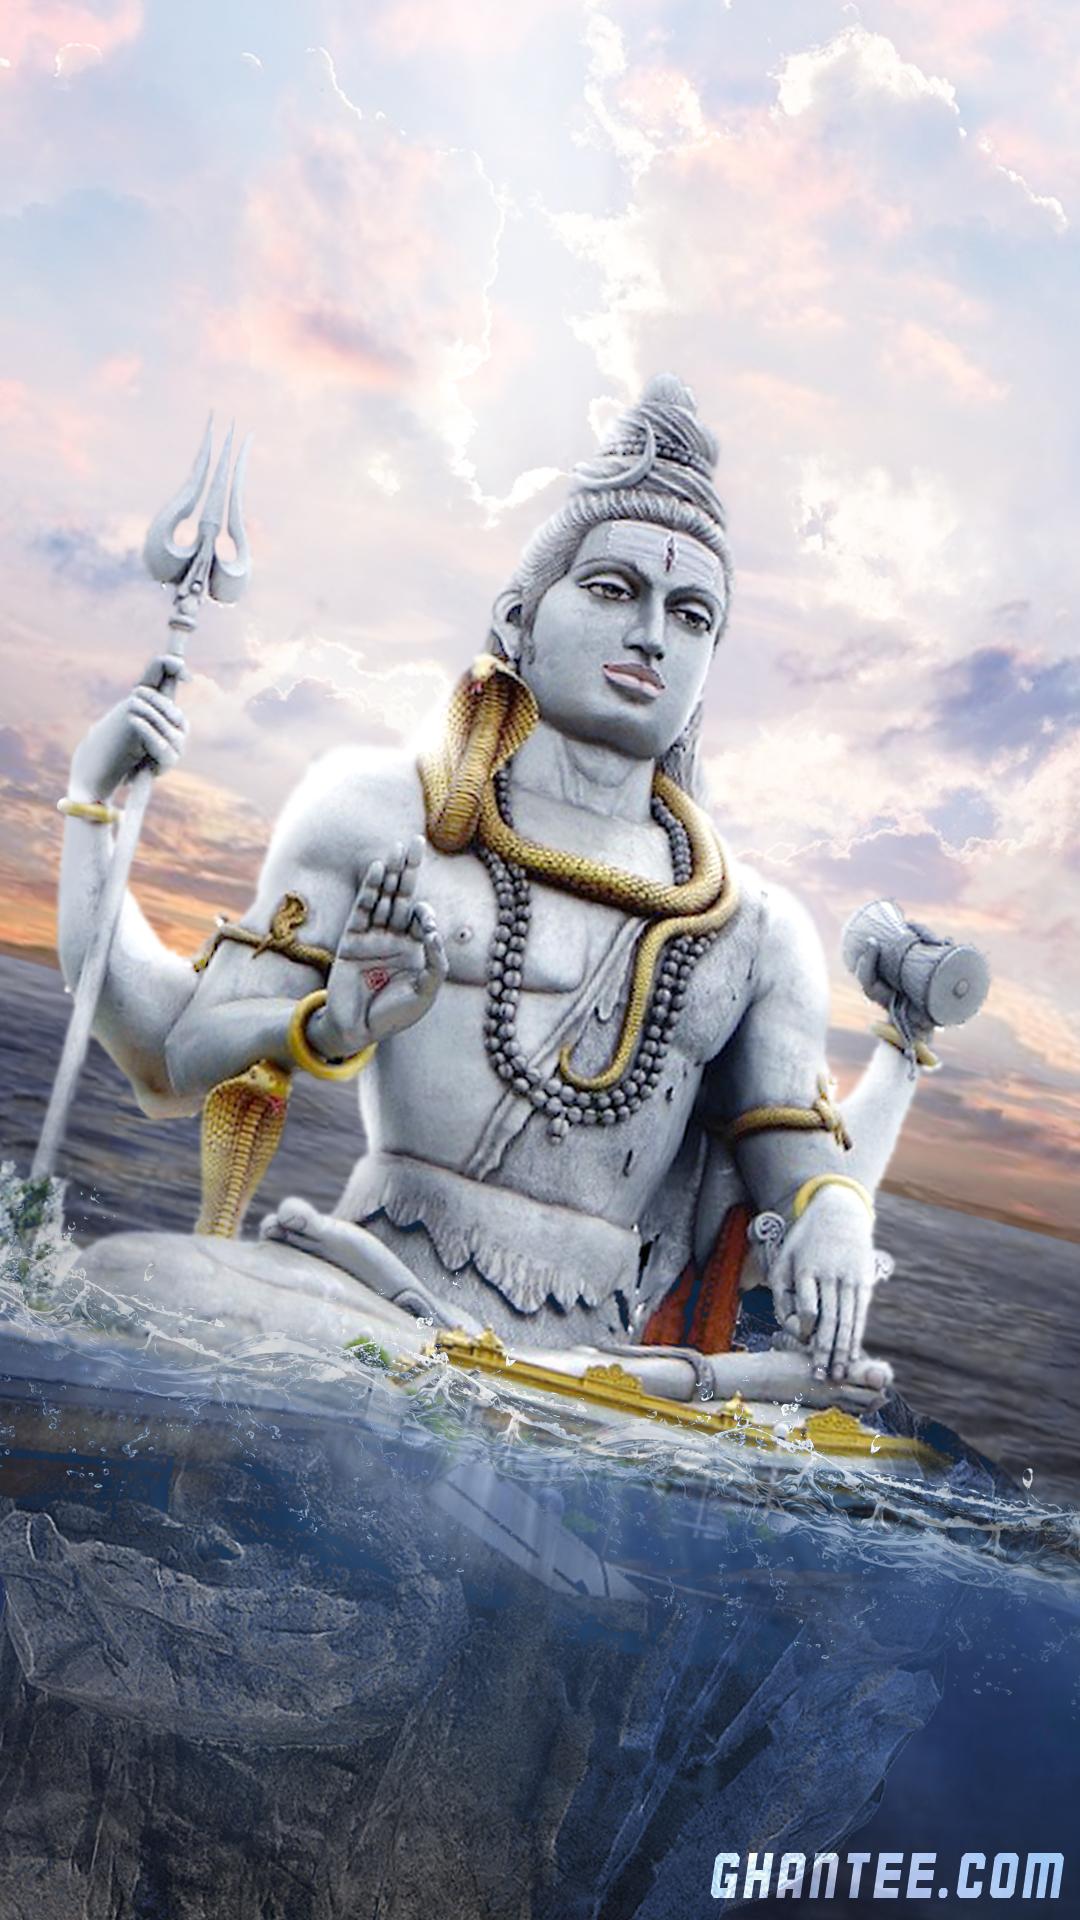 lord shiva statue in water hd phone wallpaper | full HD